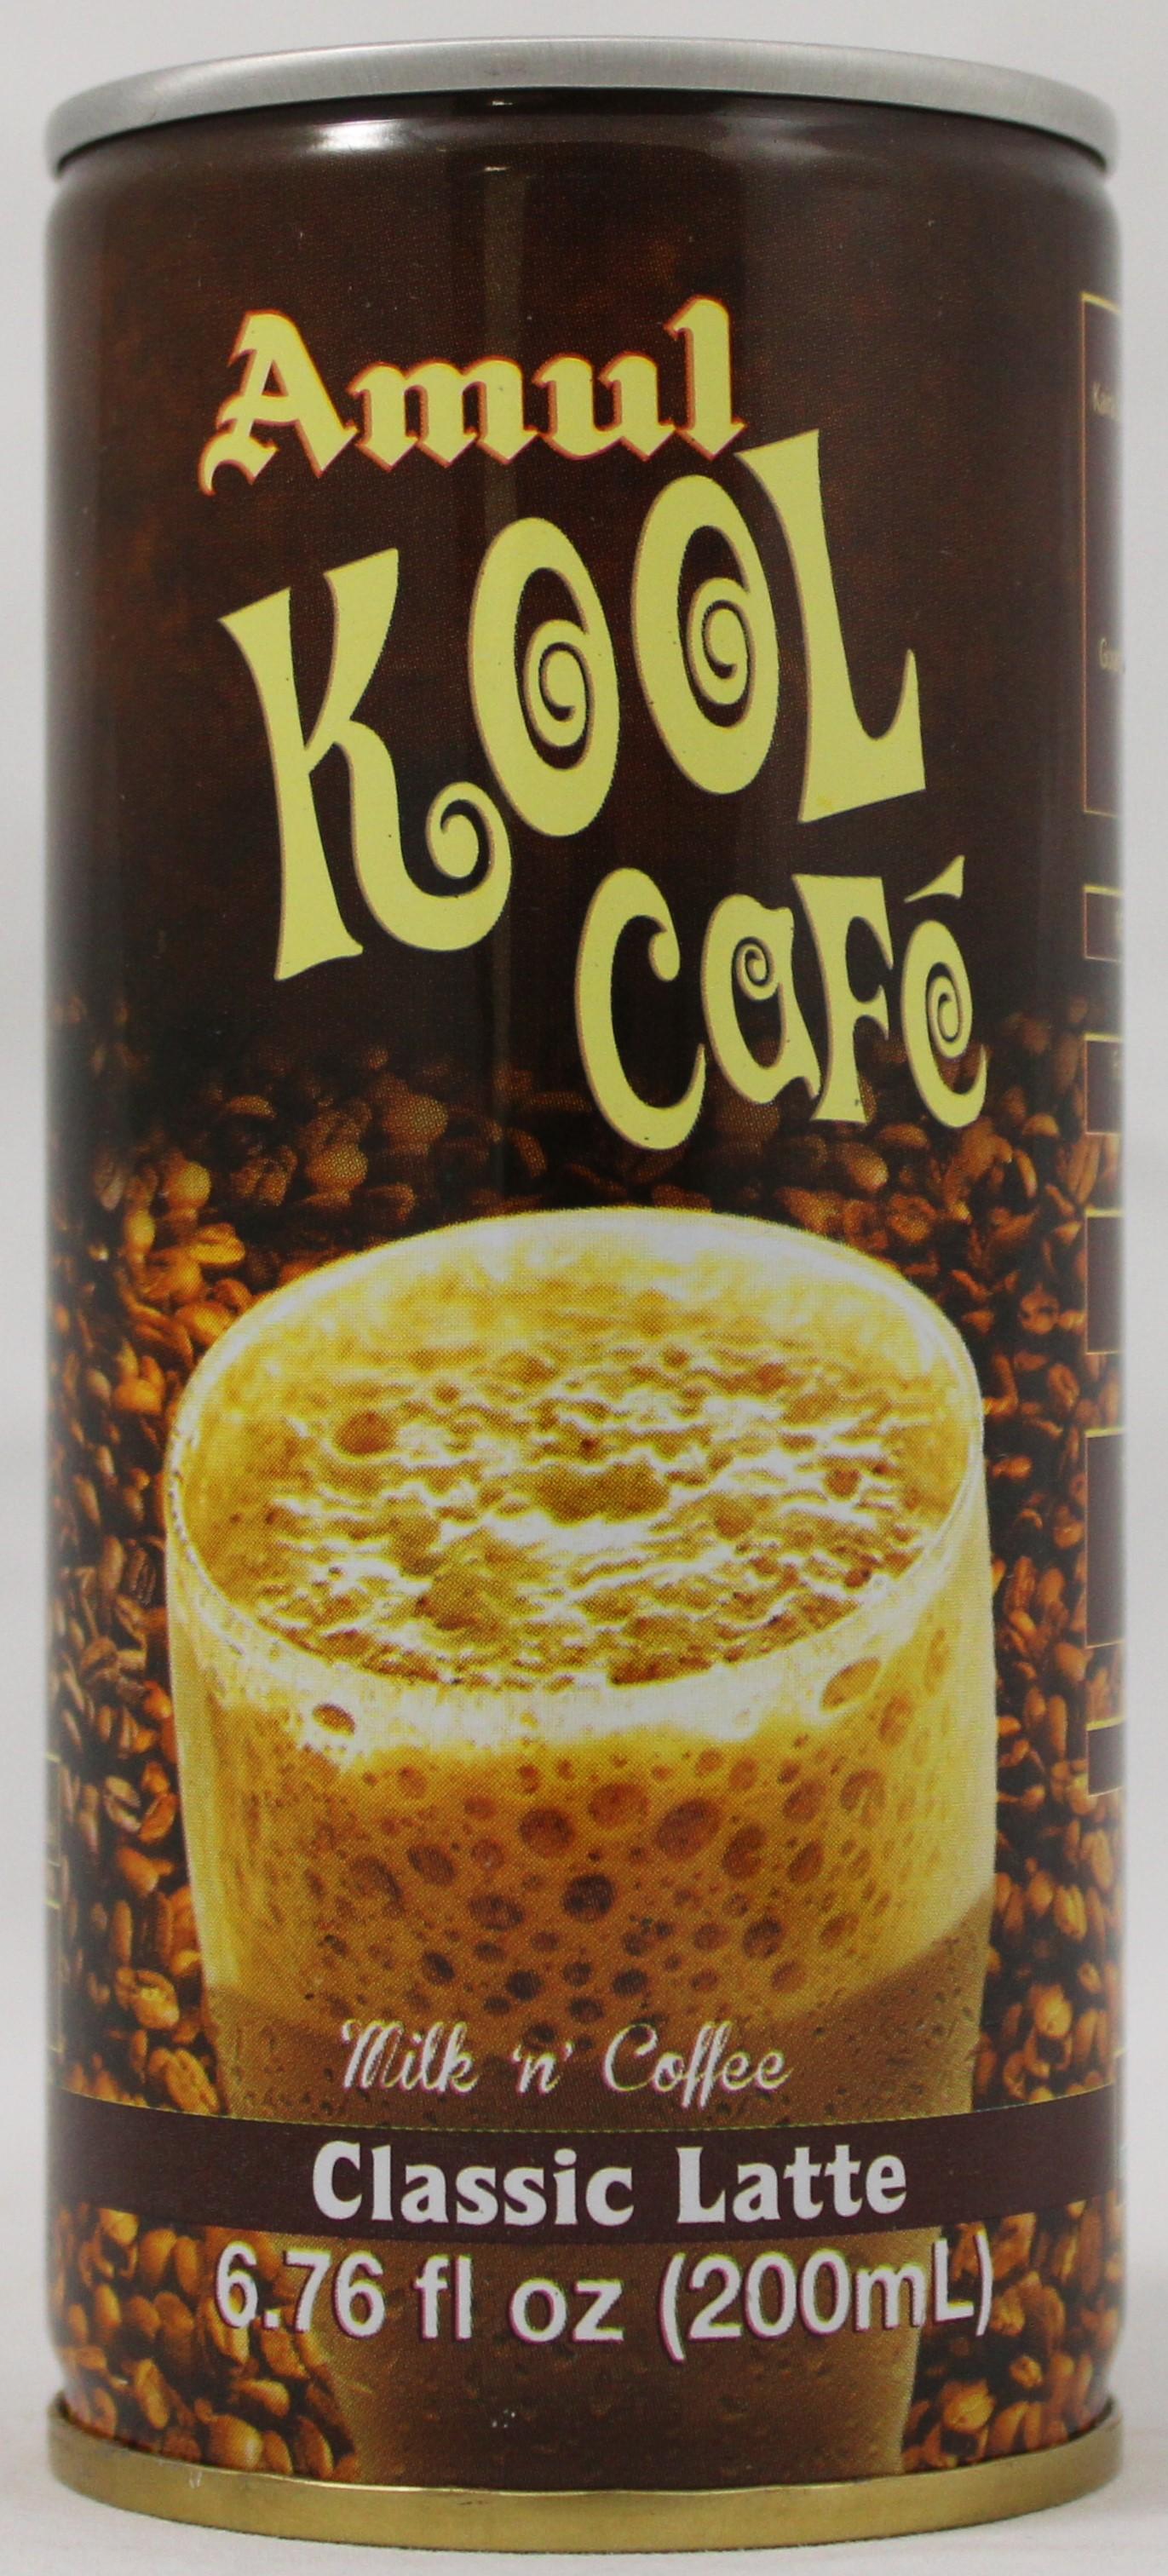 Kool Cafe(Can) 6.76Floz